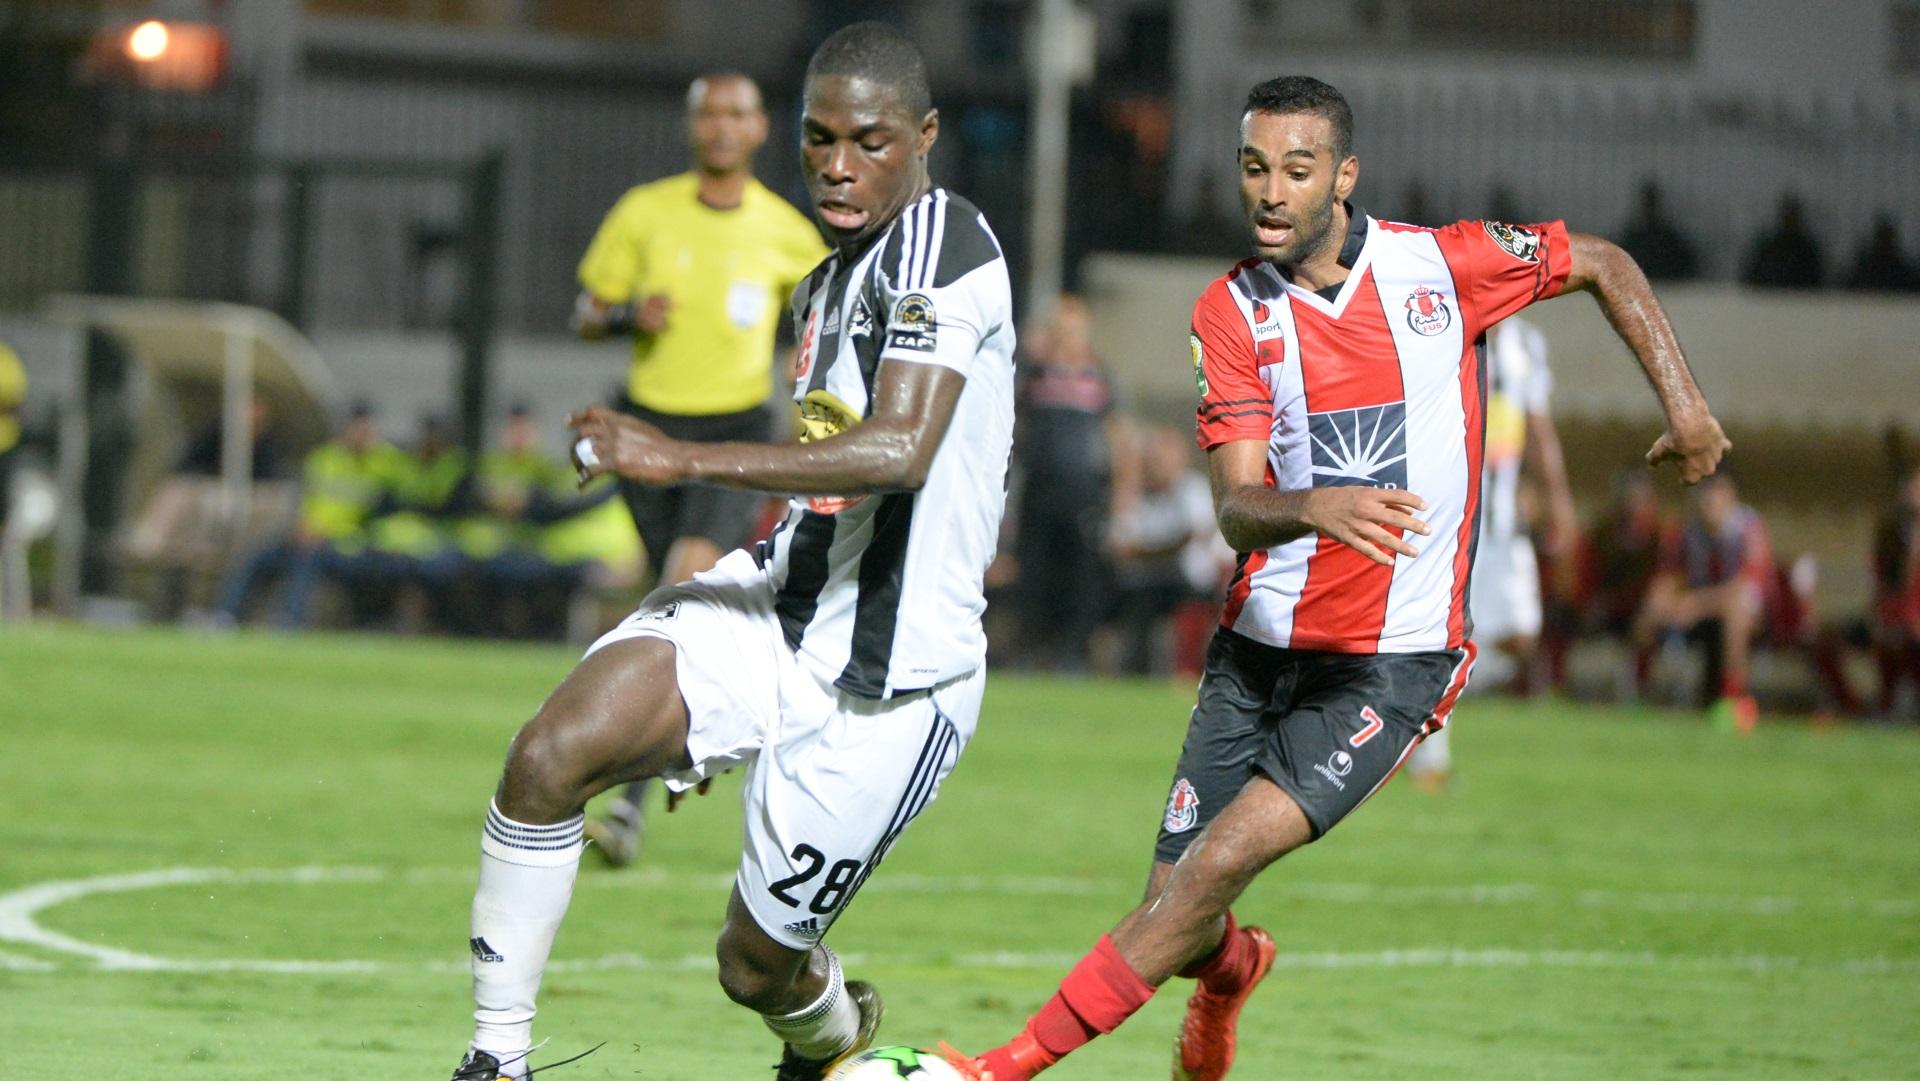 Ben Malango of Tout Puissant Mazembe, Badr Boulhroud of FATH Union Sport